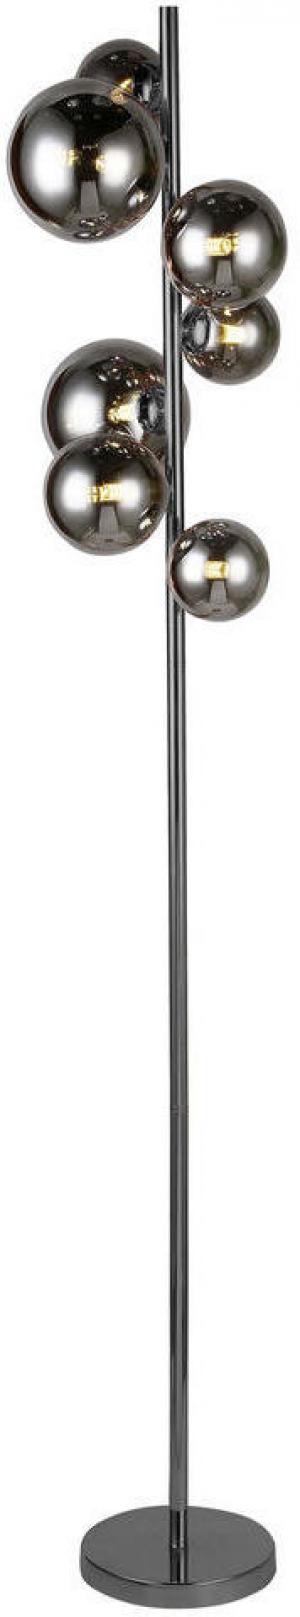 Wofi LED STOJACIA LAMPA, 35/25/155 cm - čierna, chrómová